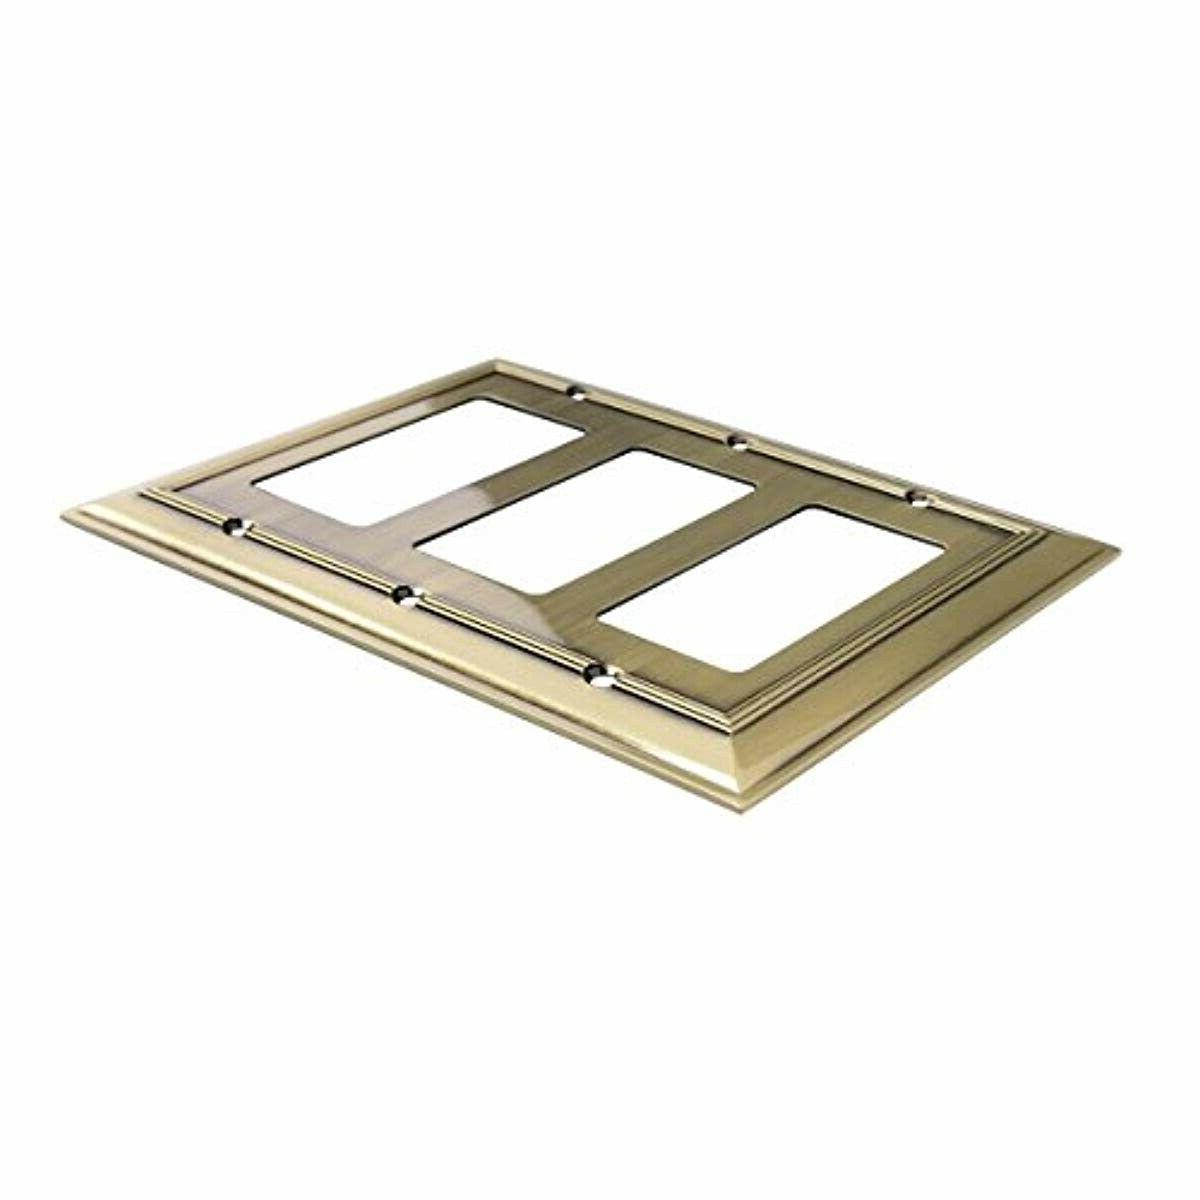 AmazonBasics Triple Plate, Brass, 1-Pack